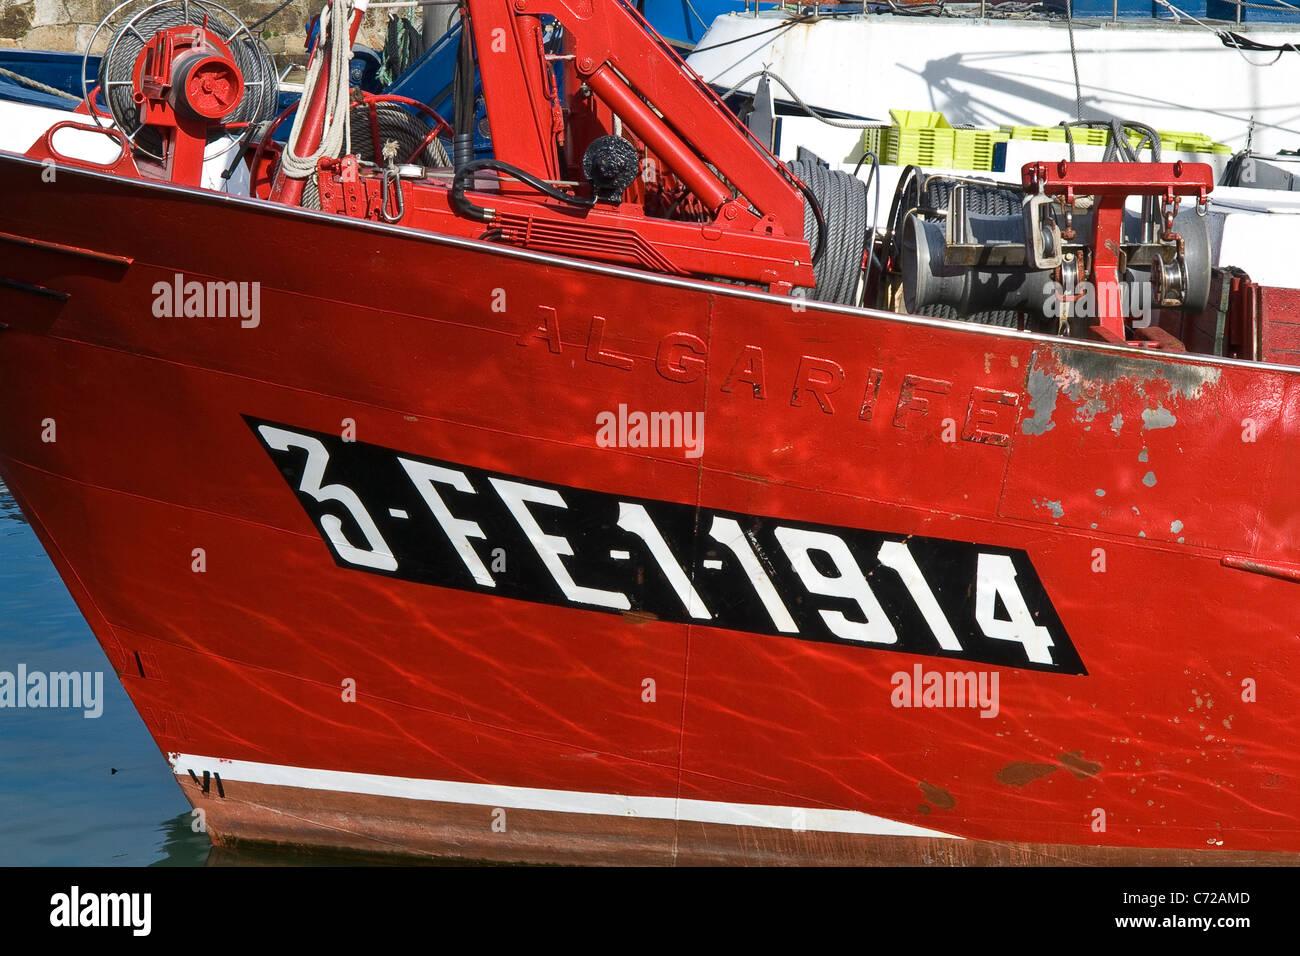 Fisher ship, Santurtzi, Bizkaia province, Basque country, Spain. - Stock Image